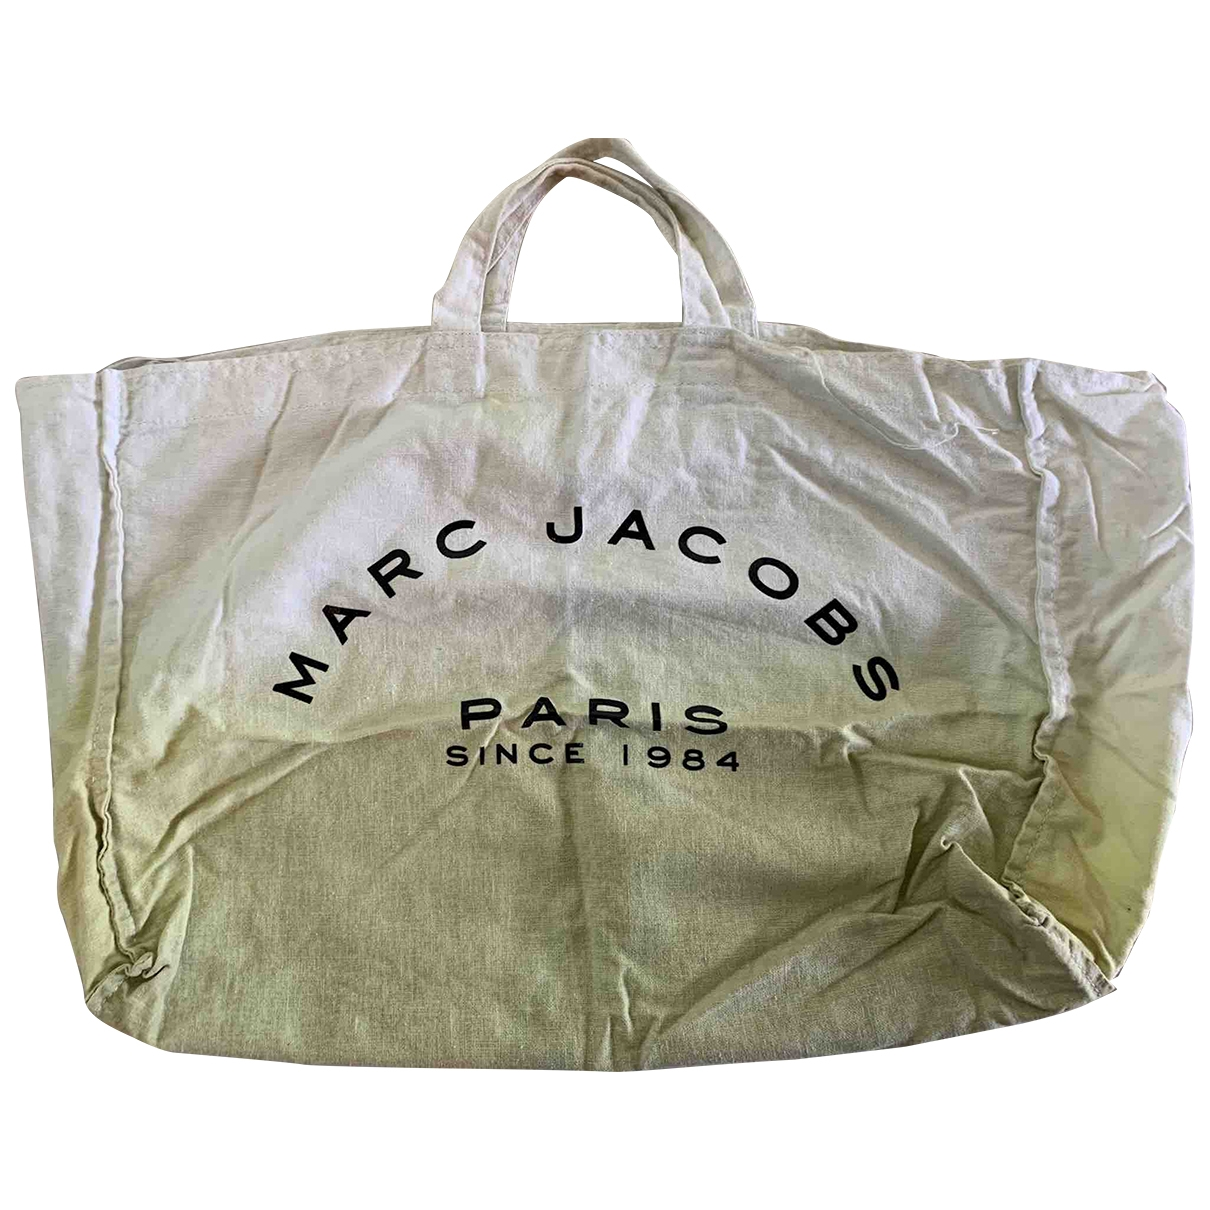 Marc By Marc Jacobs \N Handtasche in  Gruen Baumwolle